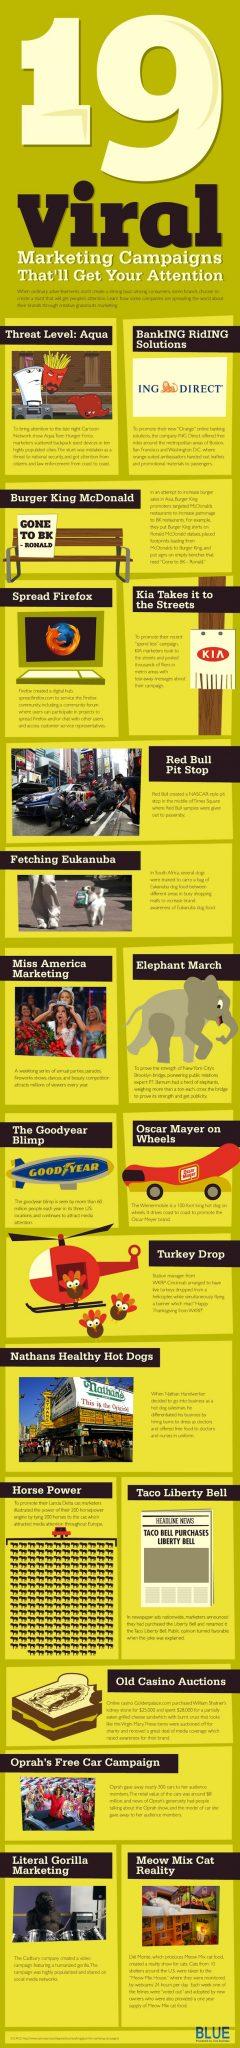 19 Viral Marketing Campaigns